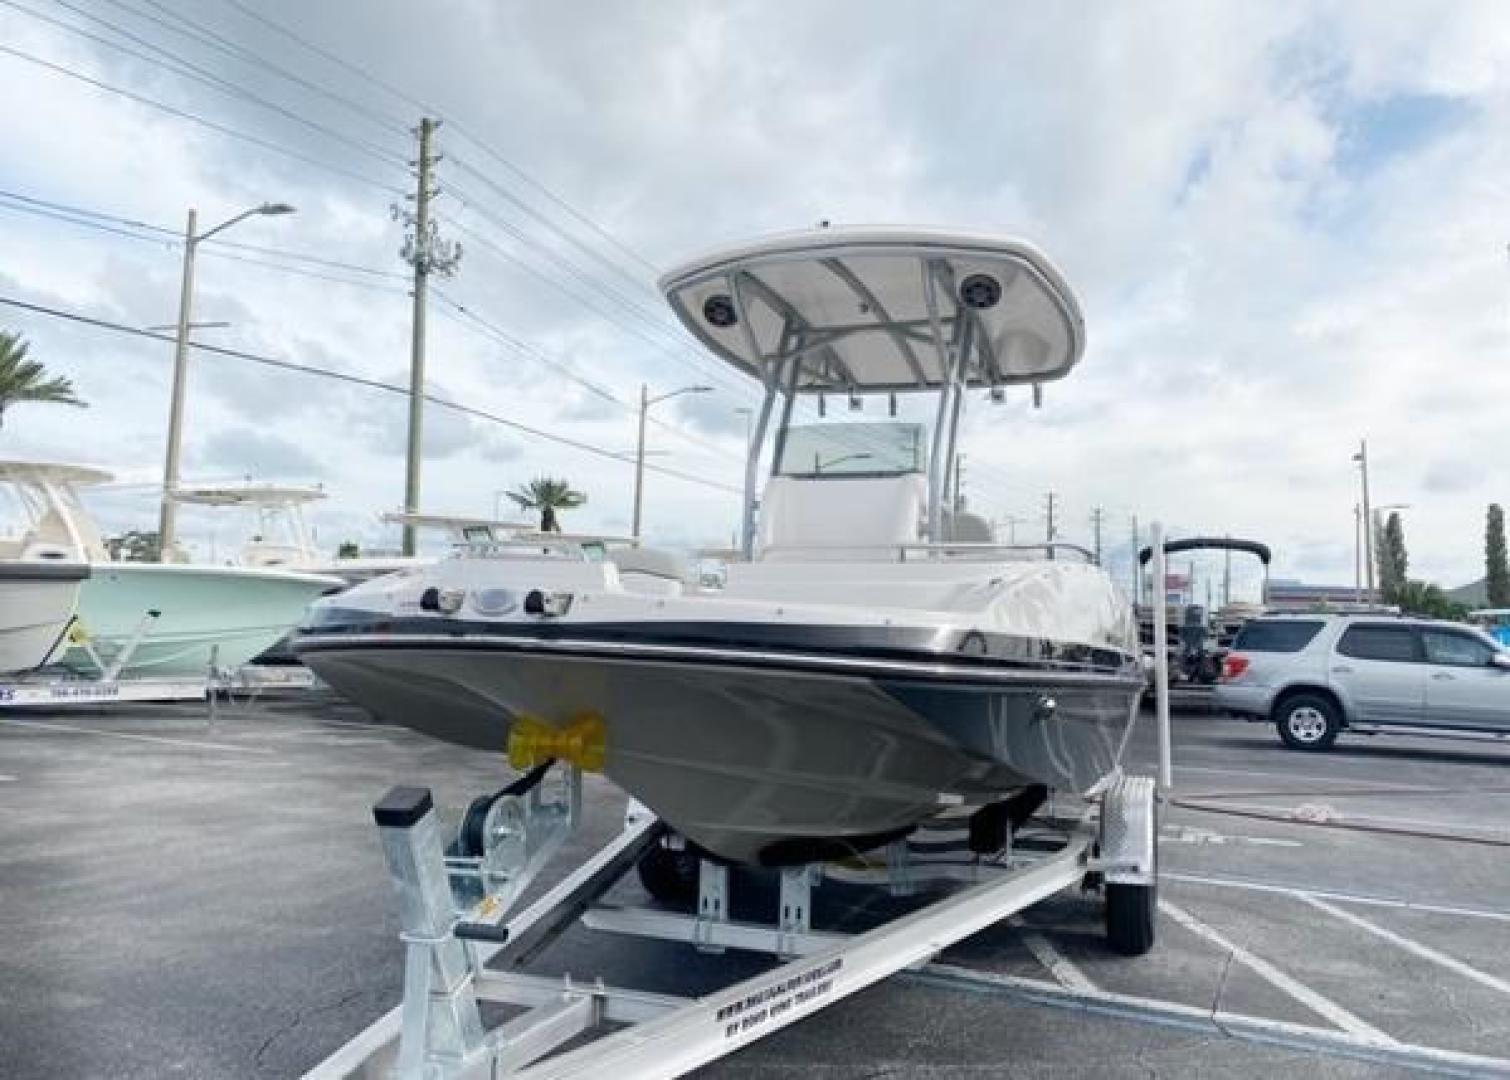 Starcraft-MDX 211 CC 2021-Starcraft MDX 211 CC Tampa Bay-Florida-United States-1532992 | Thumbnail